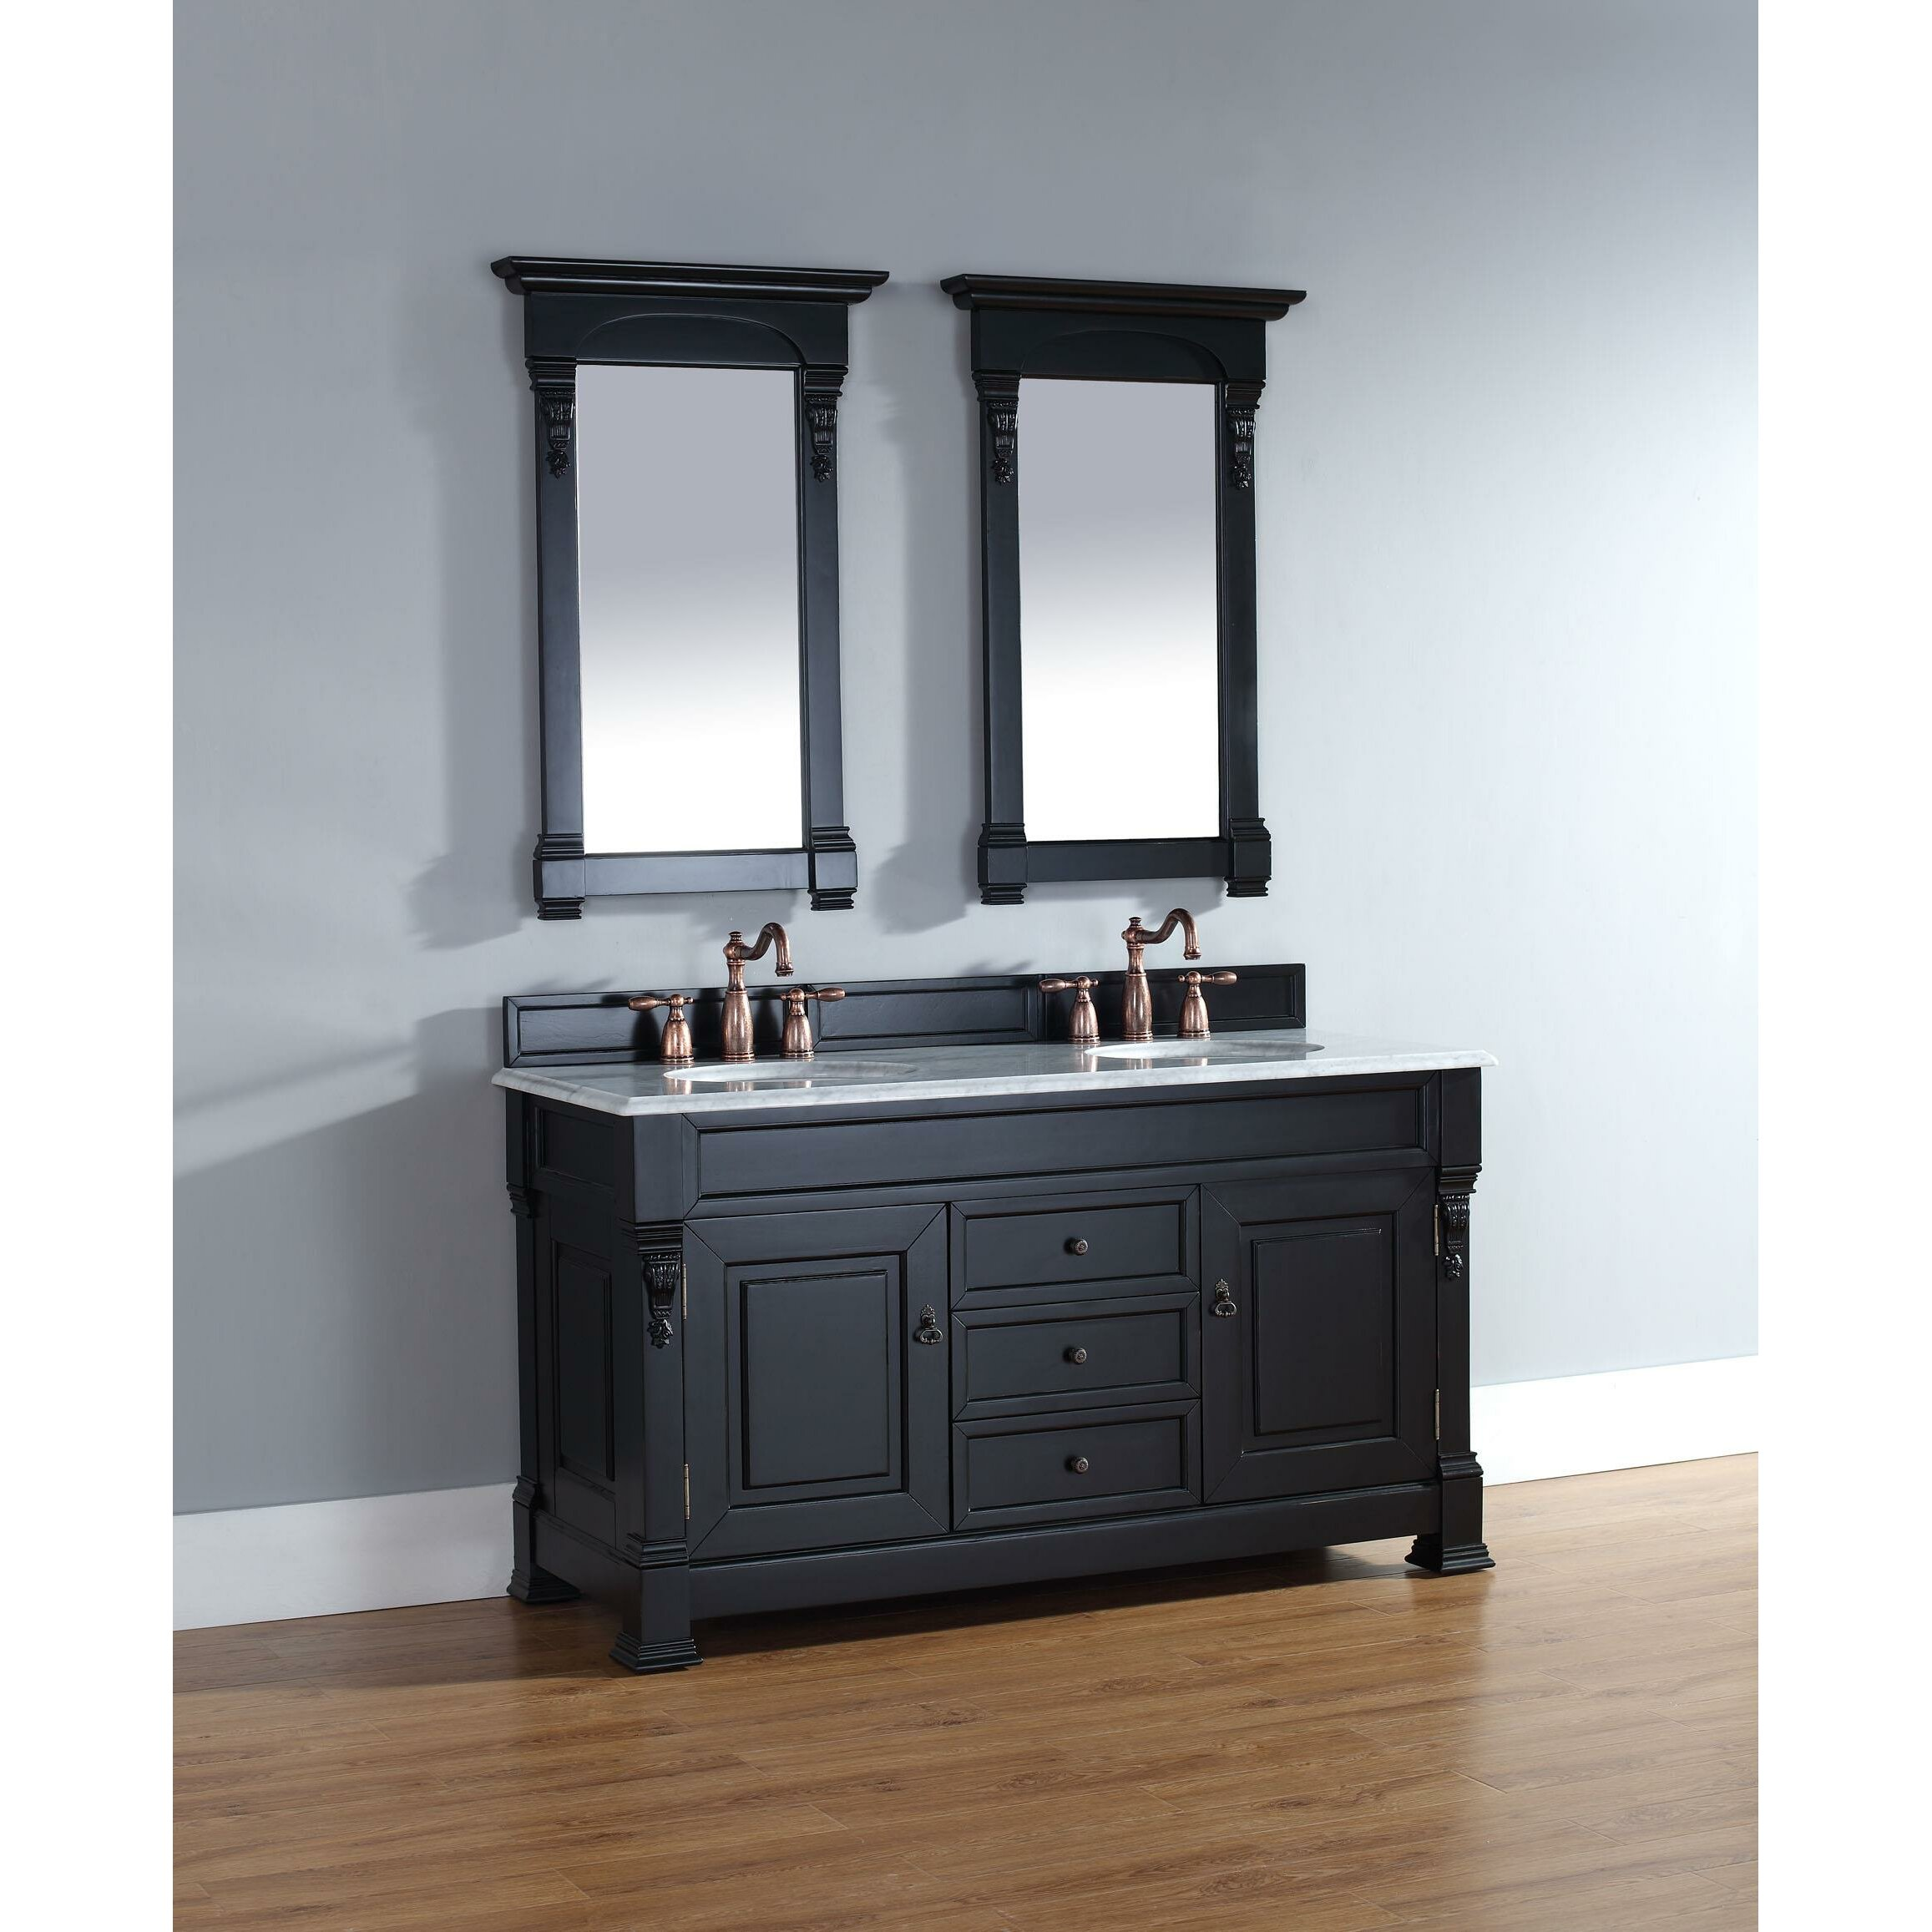 "Vintage Bathroom Vanity Set: James Martin Furniture Brookfield 60"" Double Antique Black"